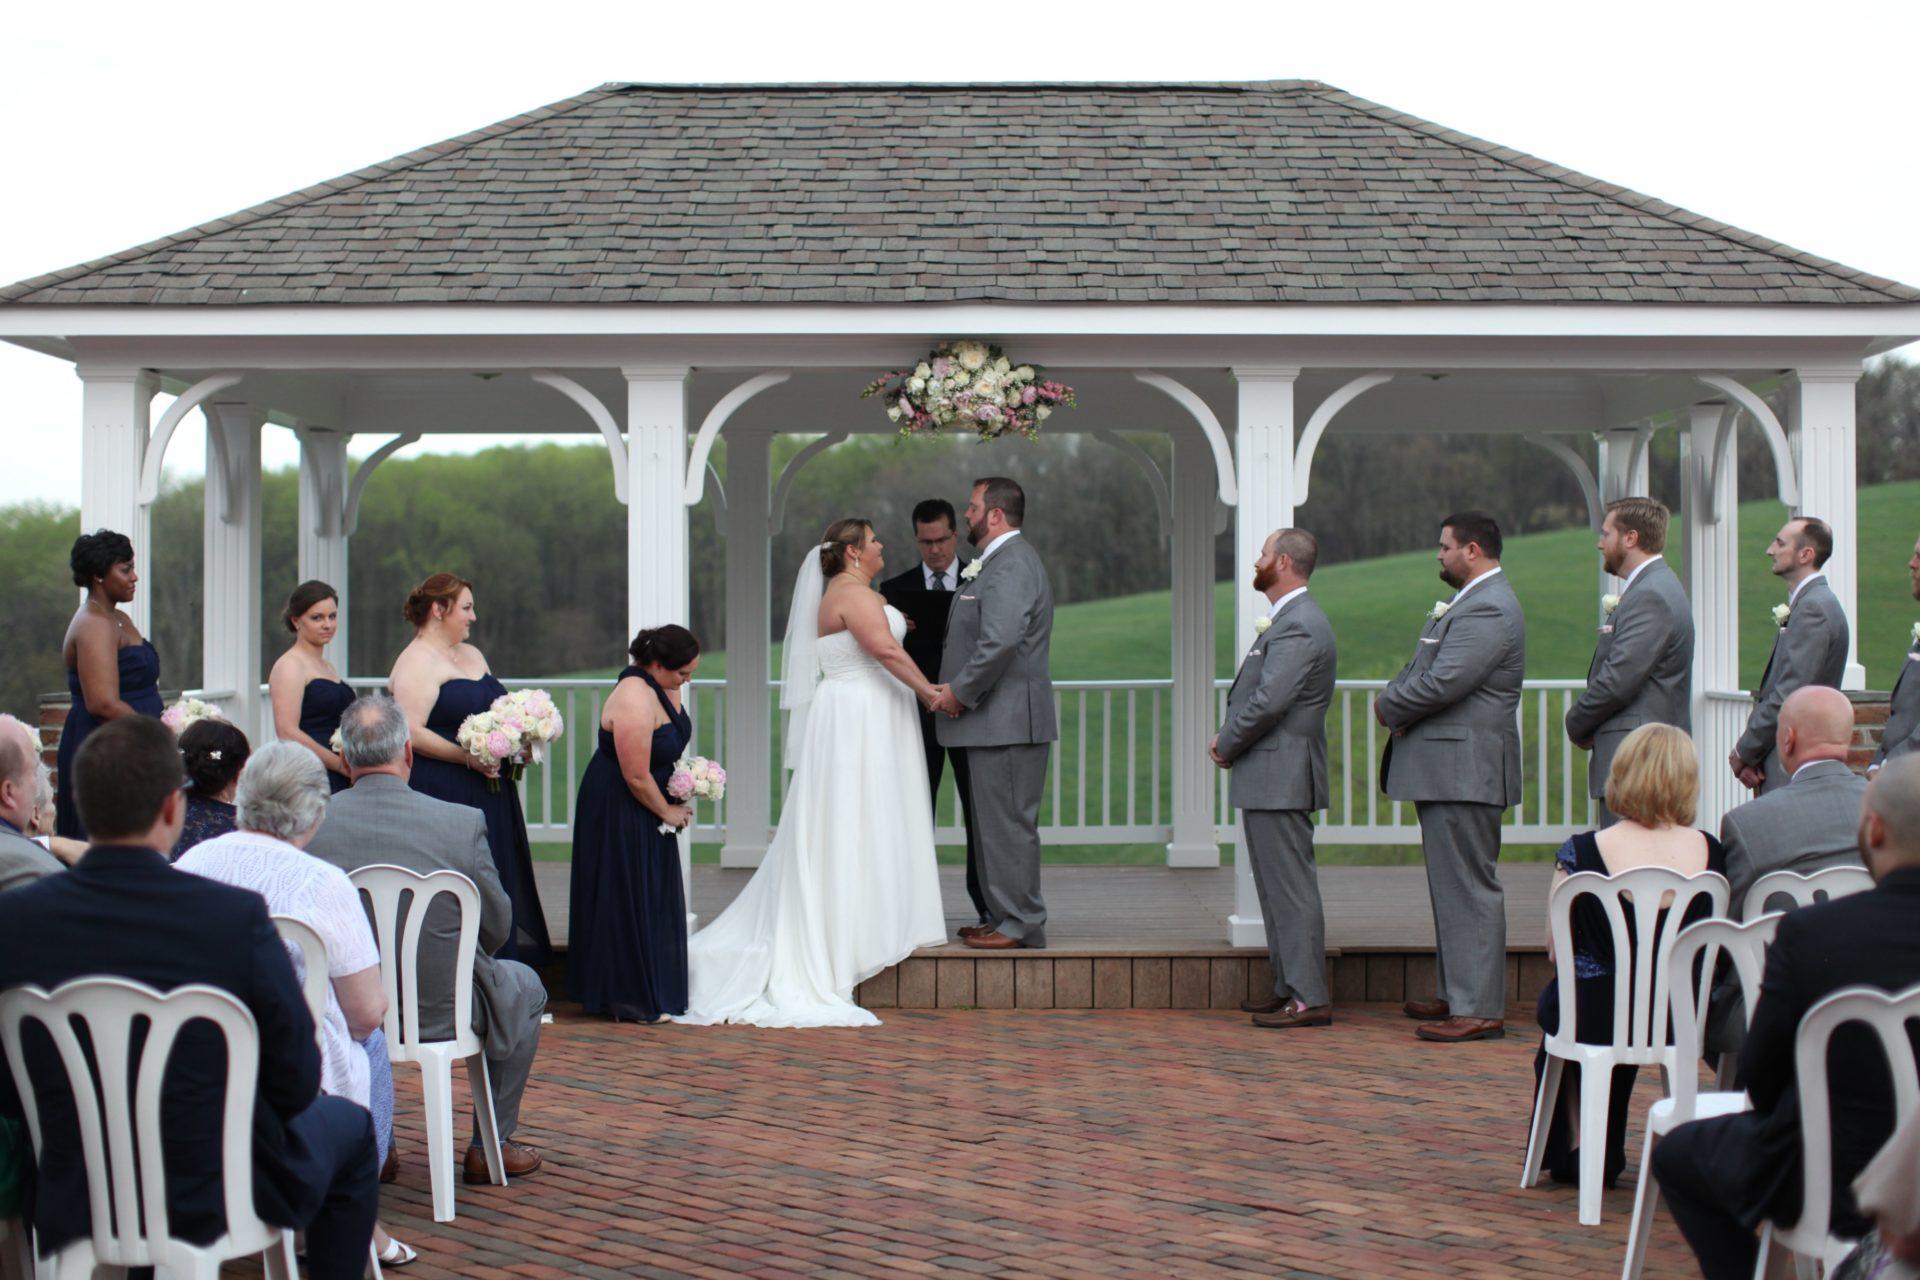 Wedding pavilion Sam & Amy's Wedding April 15 2017